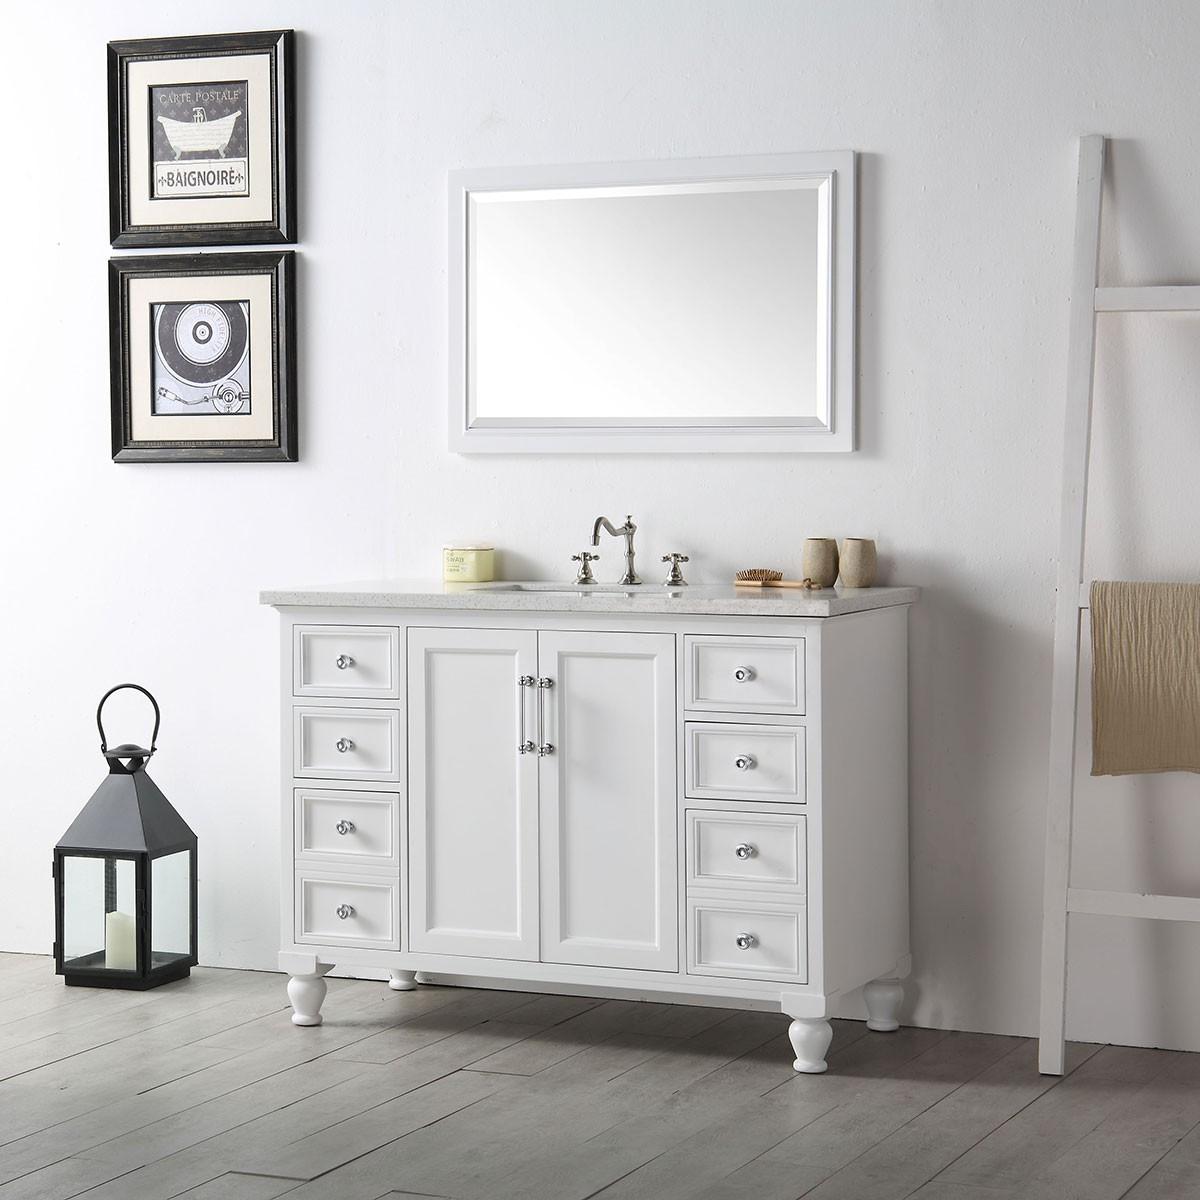 vanity set without mirror. 48 In  Bathroom Vanity Set without Mirror DK 6548 W Decoraport